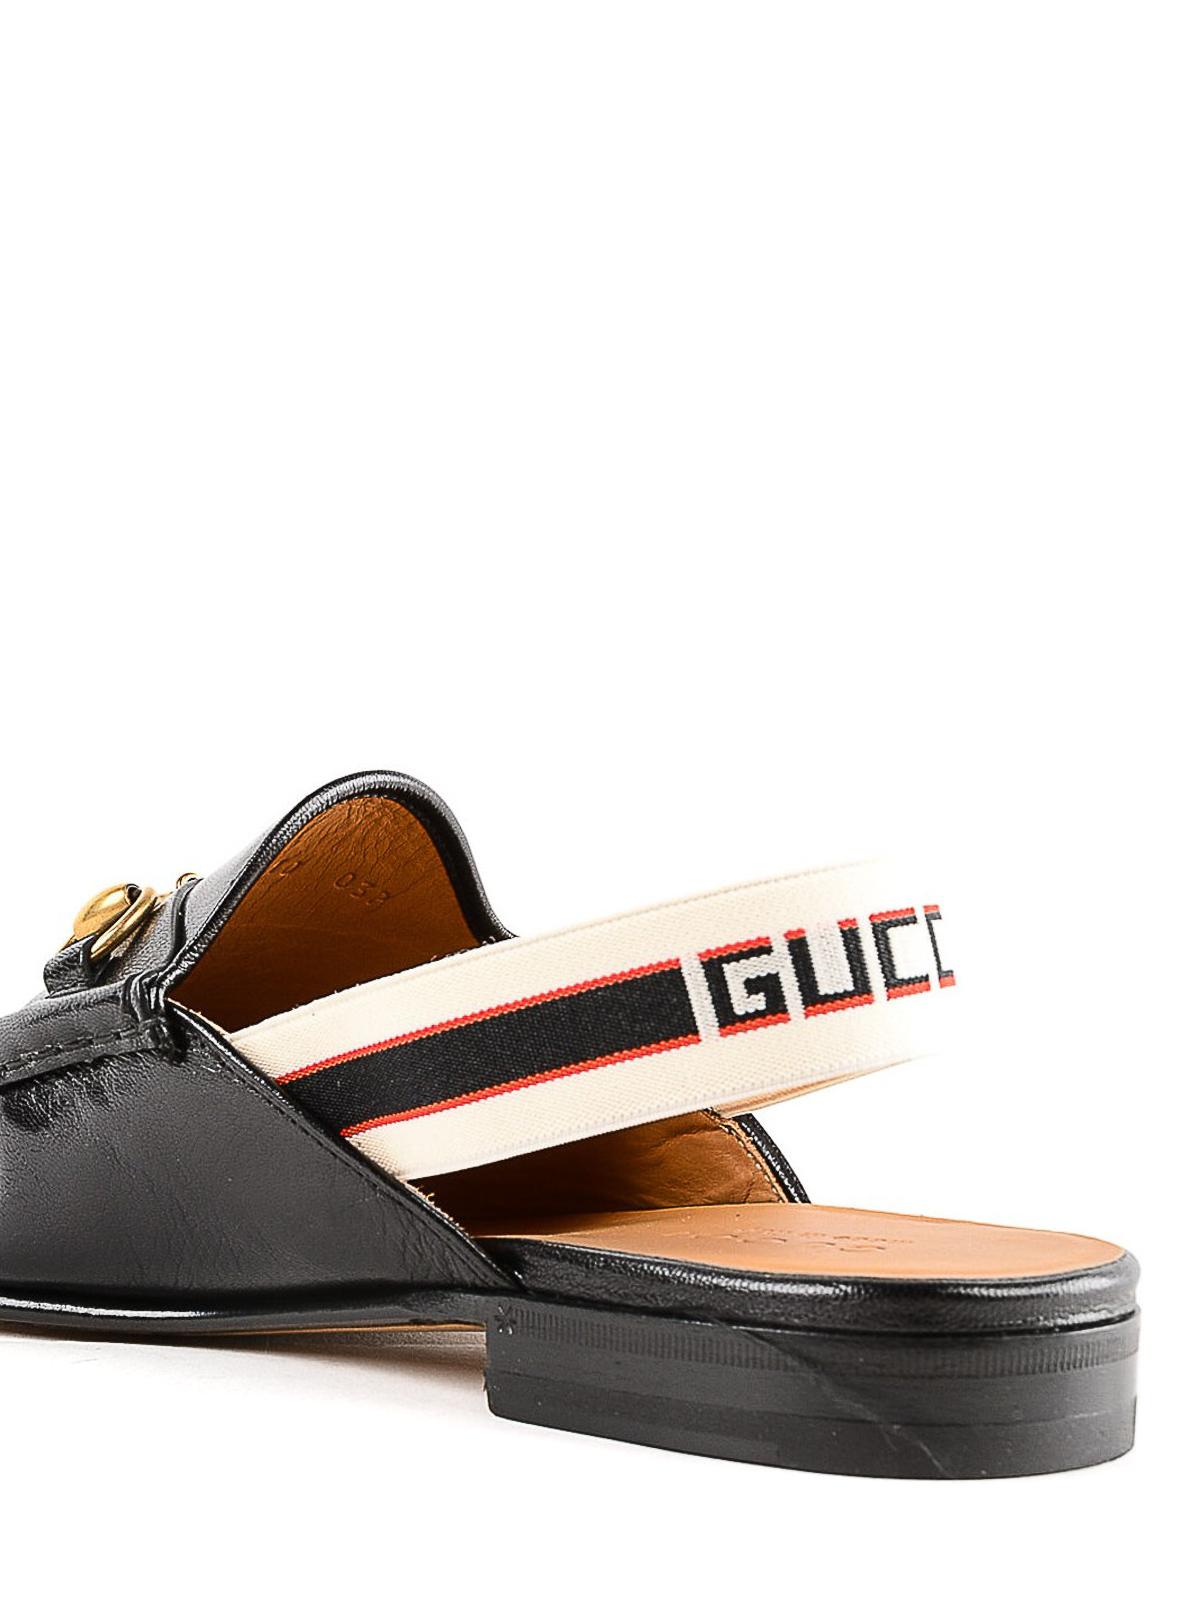 horsebit gucci stripe slingback slipper